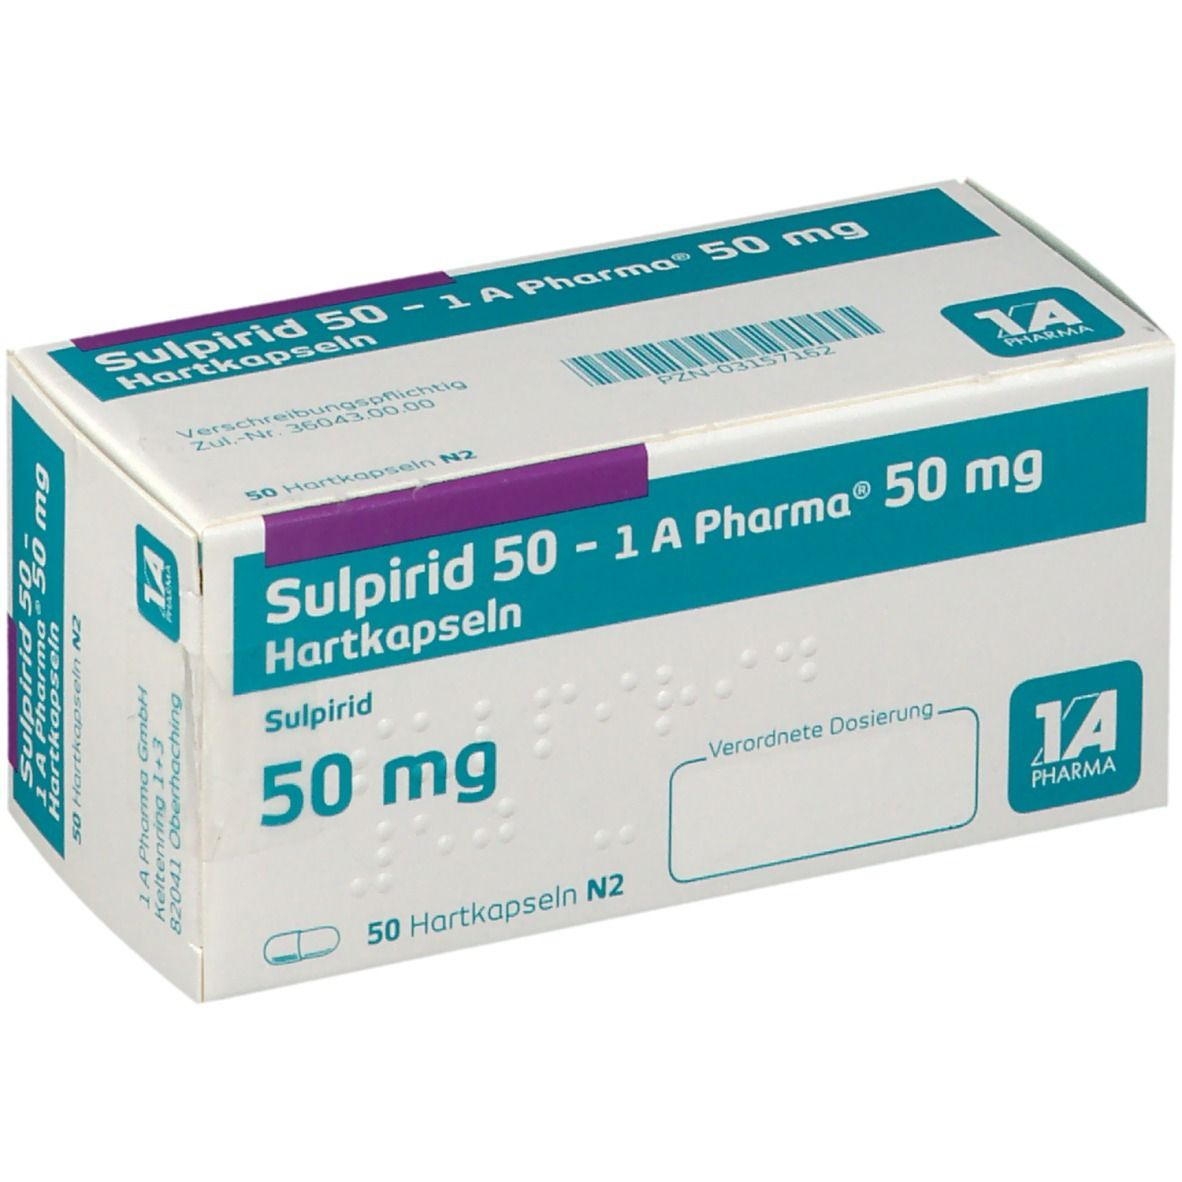 SULPIRID 50 1A Pharma Kapseln